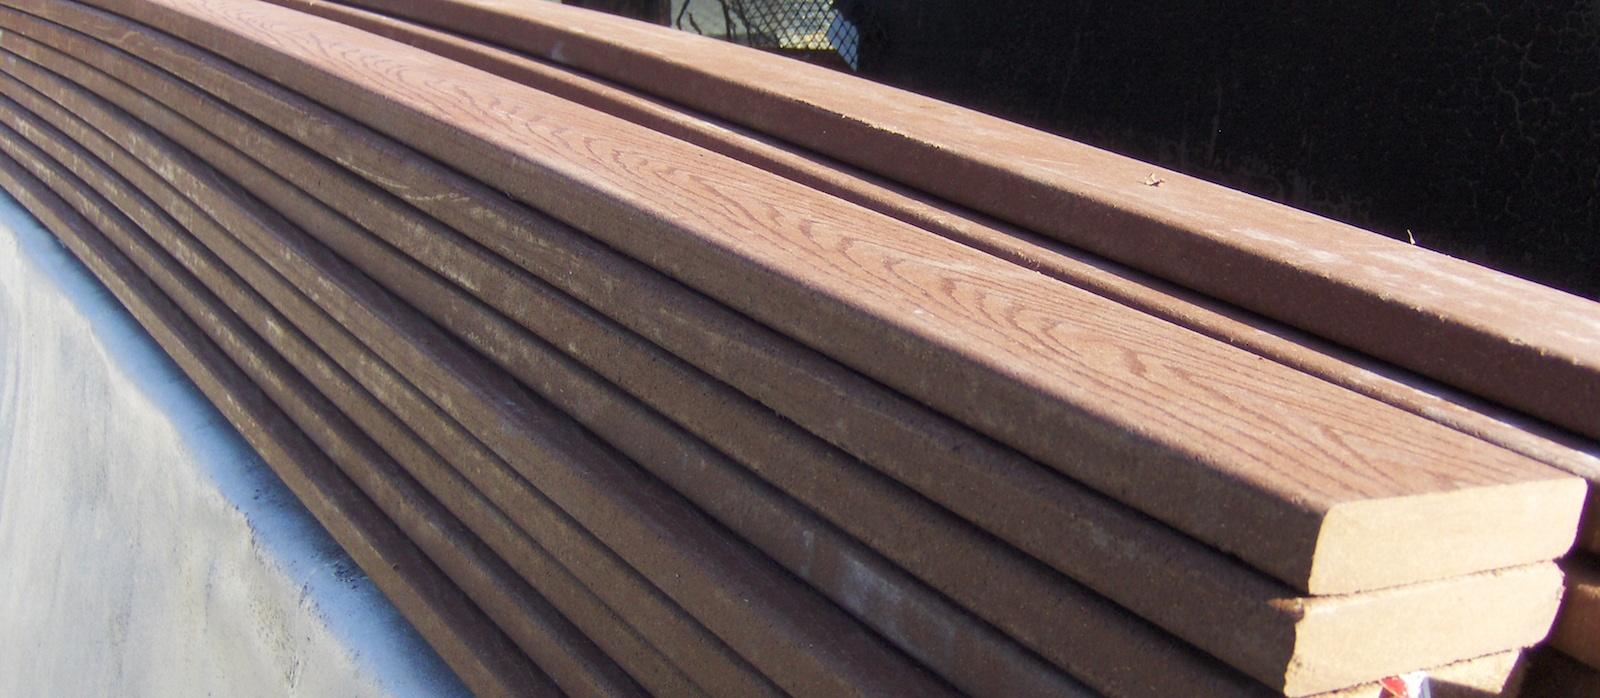 Trex composite decking vs permatrak concrete boardwalk for Composite decking pros and cons